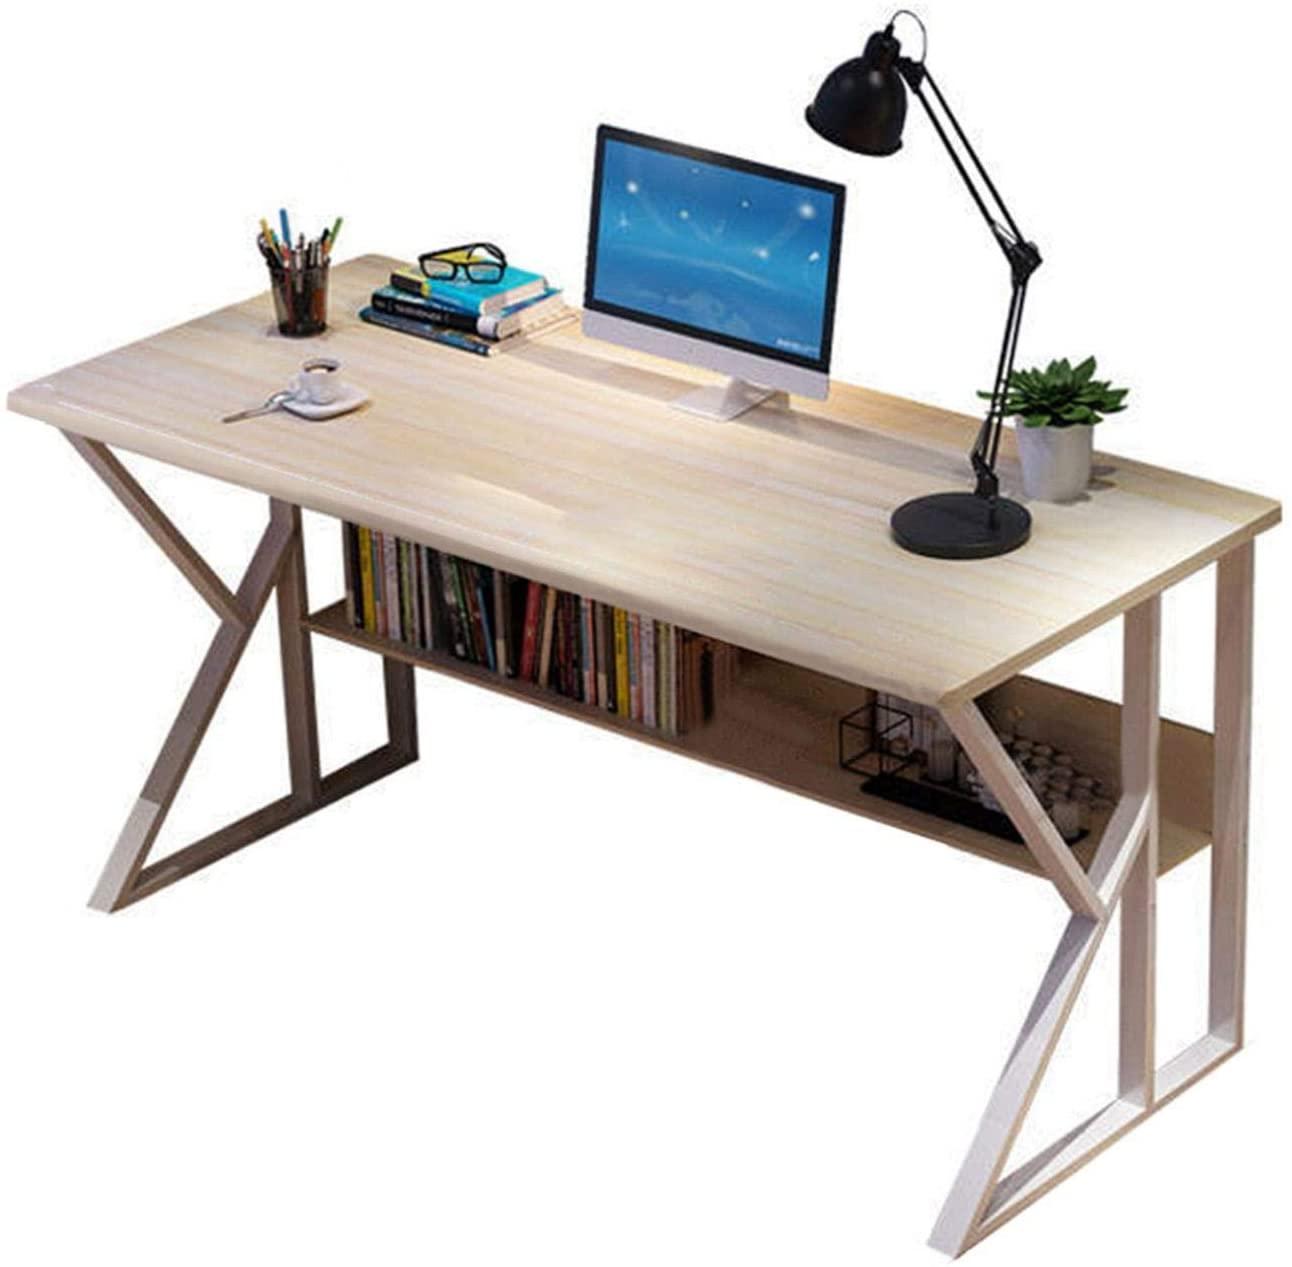 Smugglewhite Wood Color Simple Style Home Computer Desk, Office Desk Student Writing Table Modern Economical Computer Desktop Desk 23.6 x 28.8 inch